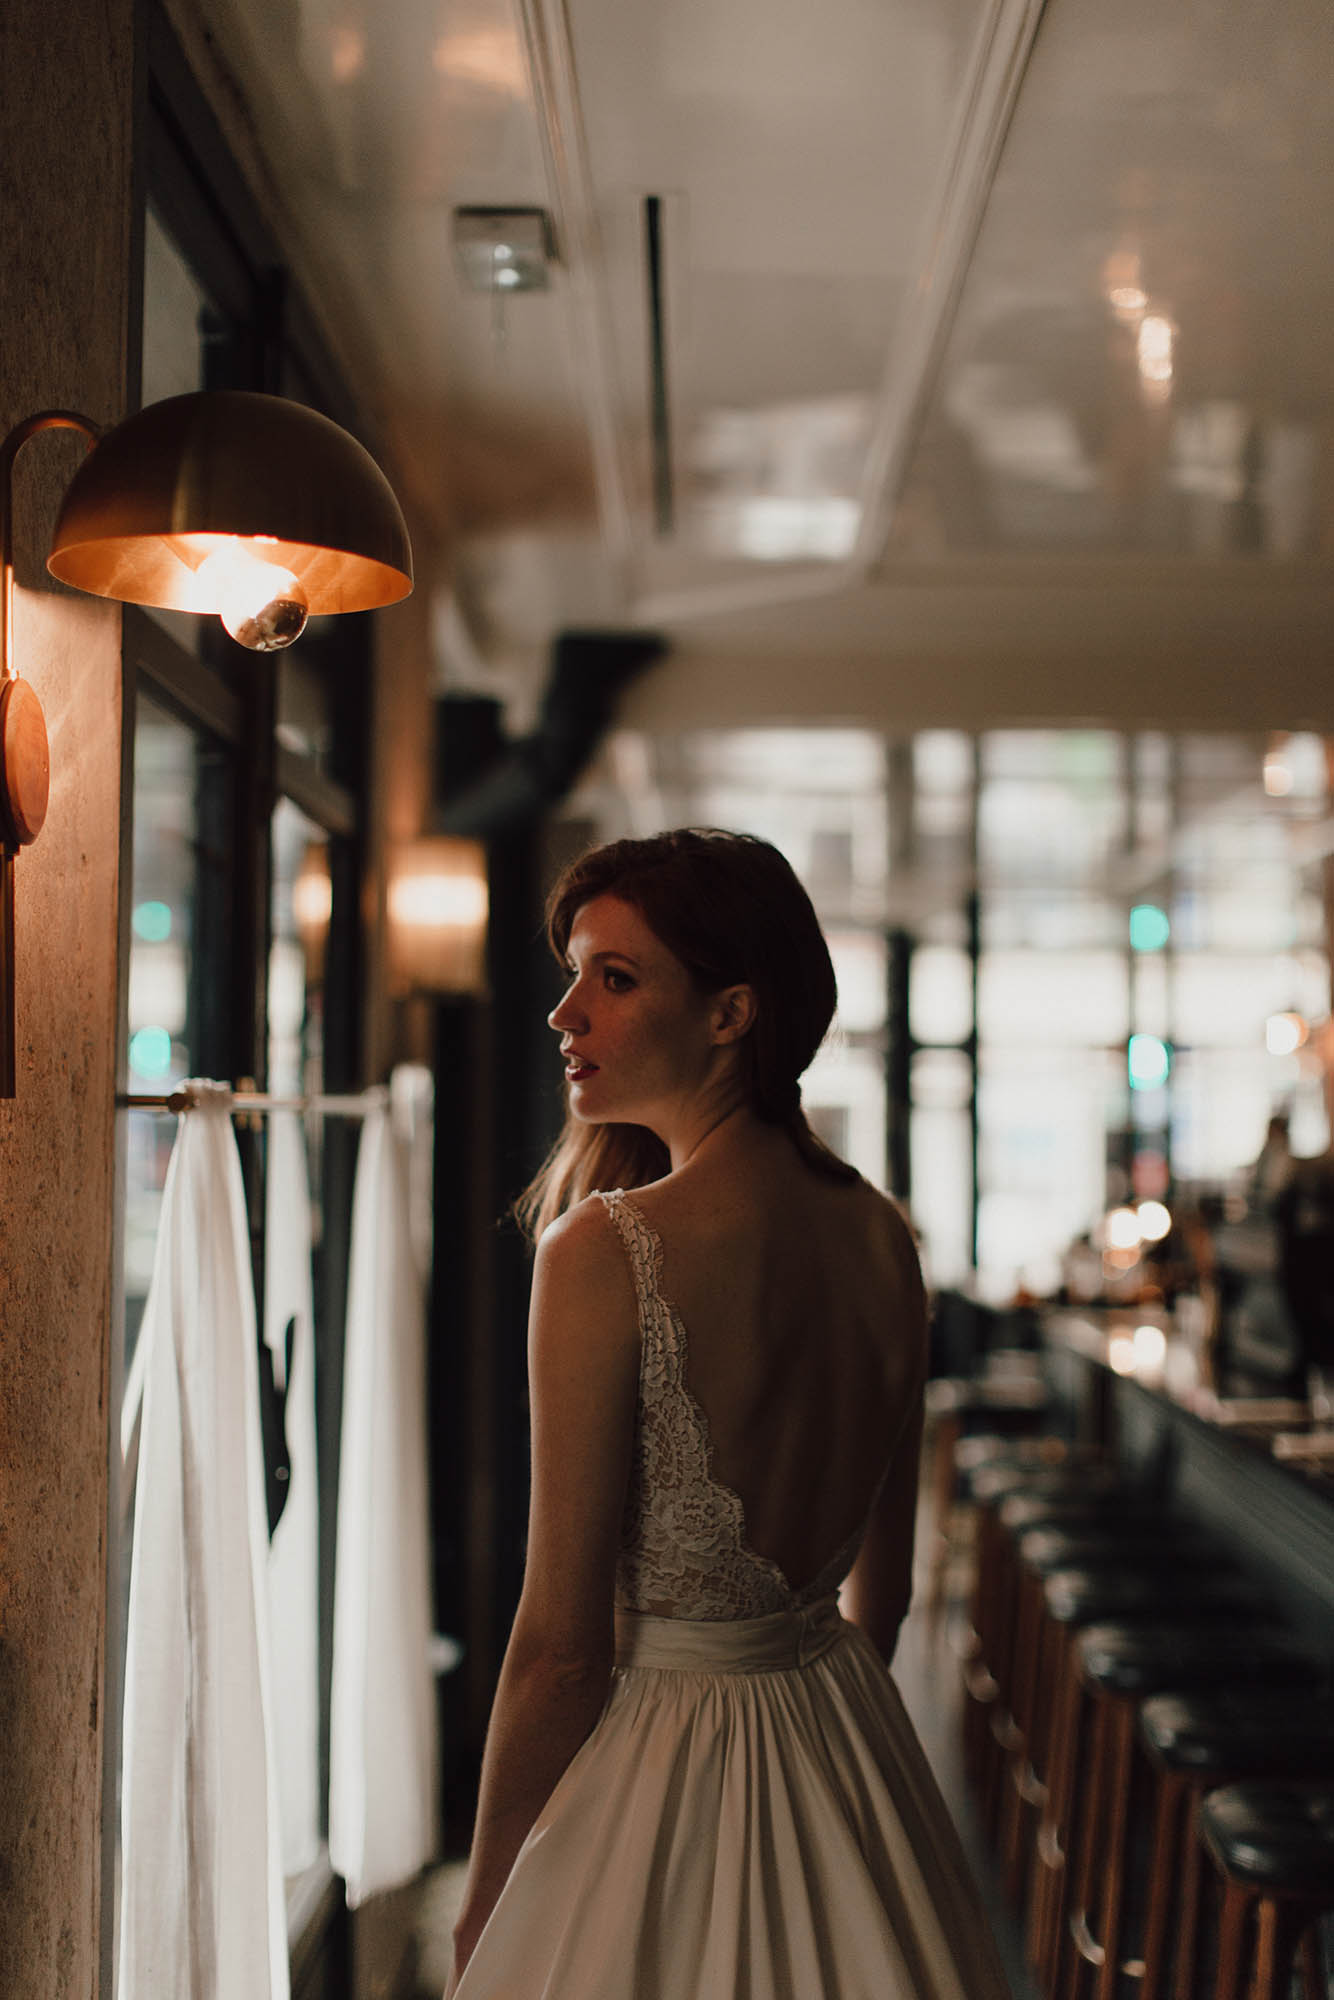 youmademydayphotography-destination-wedding-photographer-david-purves-boheme-rock-paris-web-78